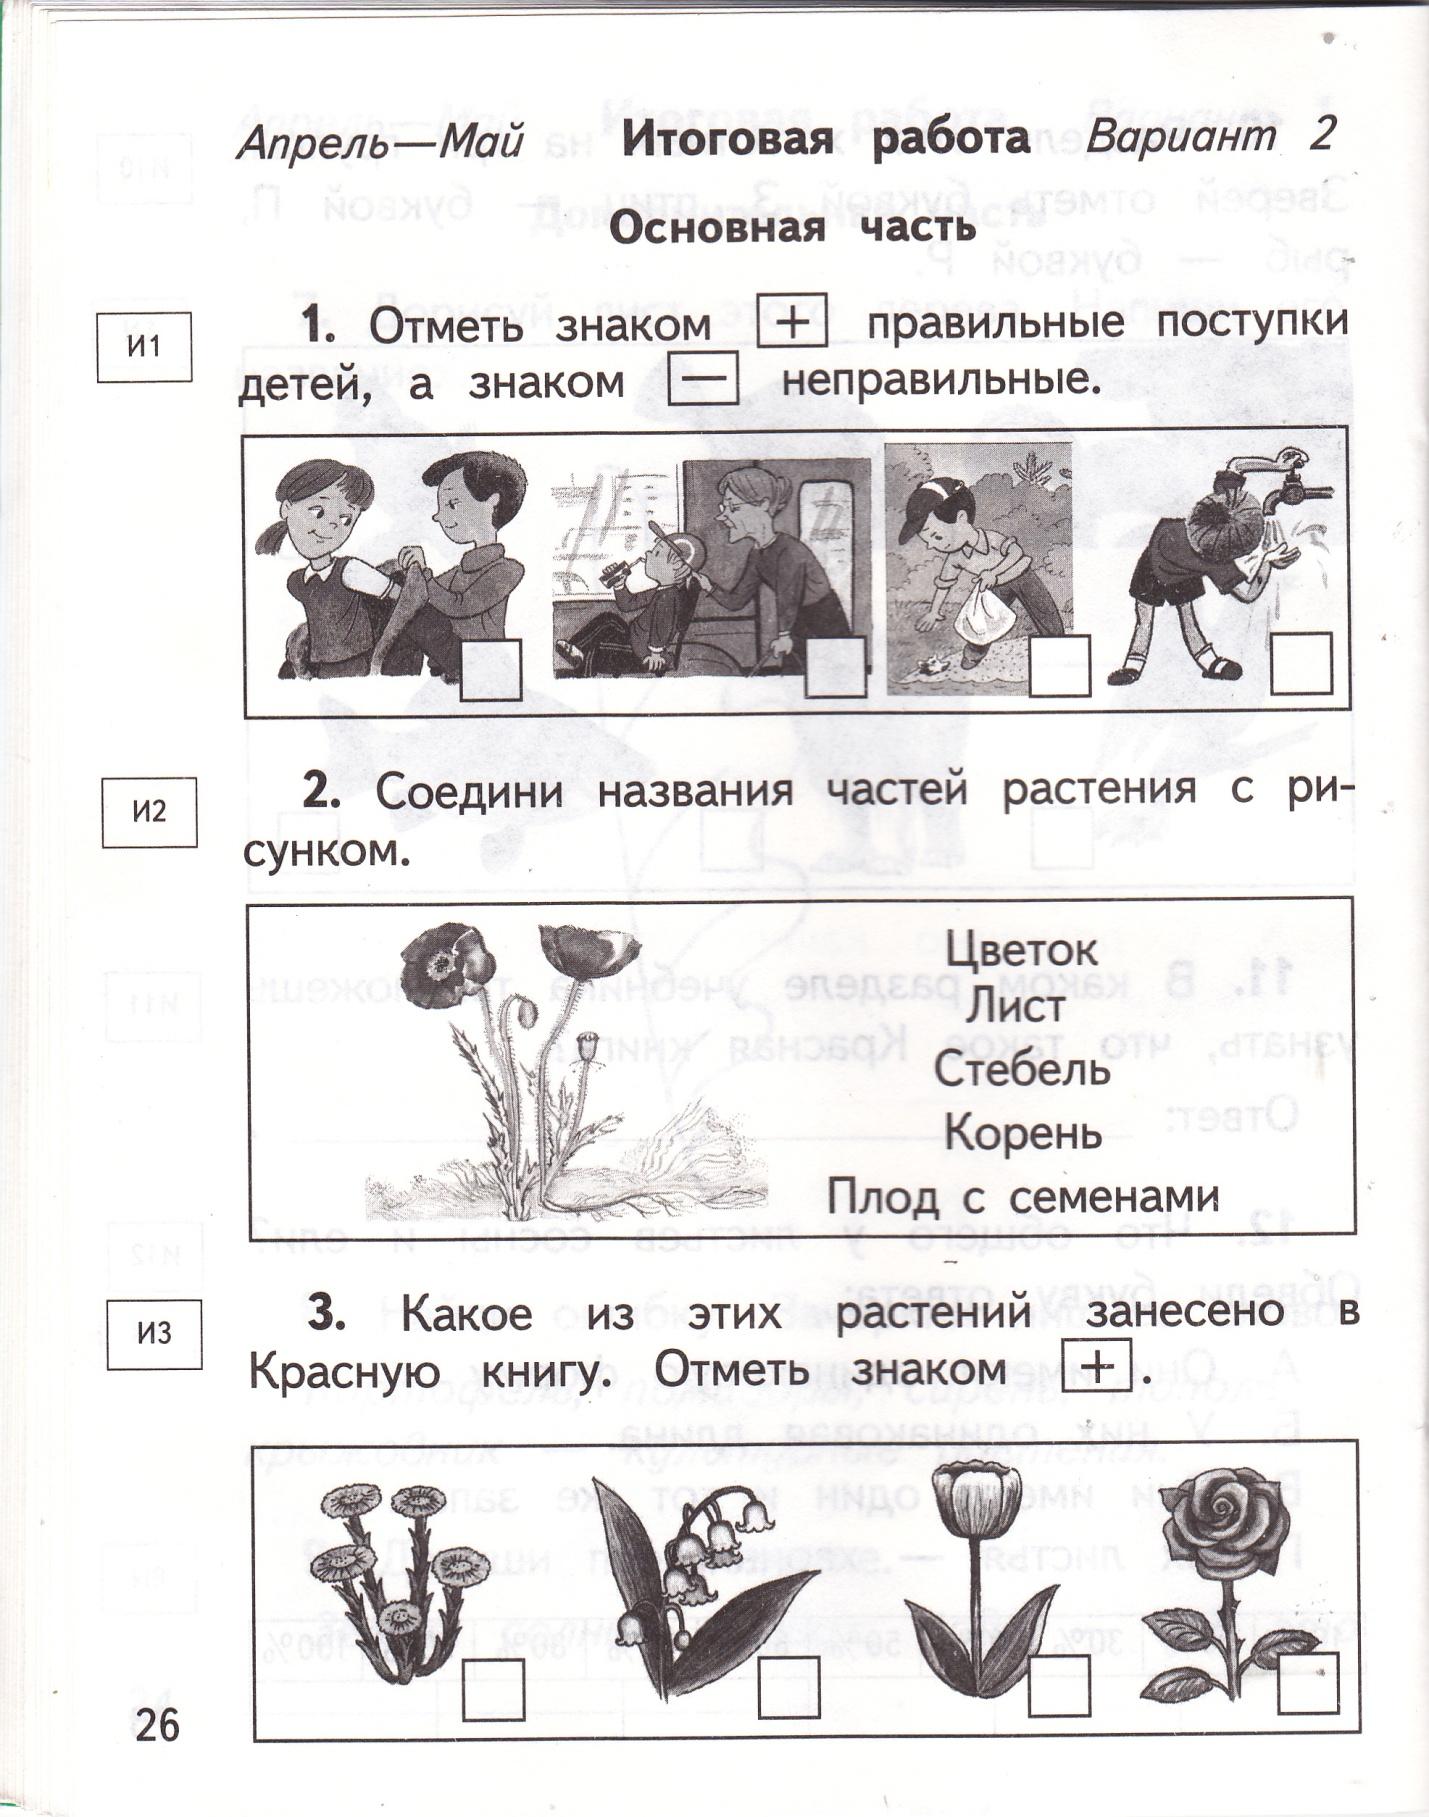 C:\Users\МБОУ СОШ № 4\Desktop\для Жуковой С.Н\IMG_0036.jpg